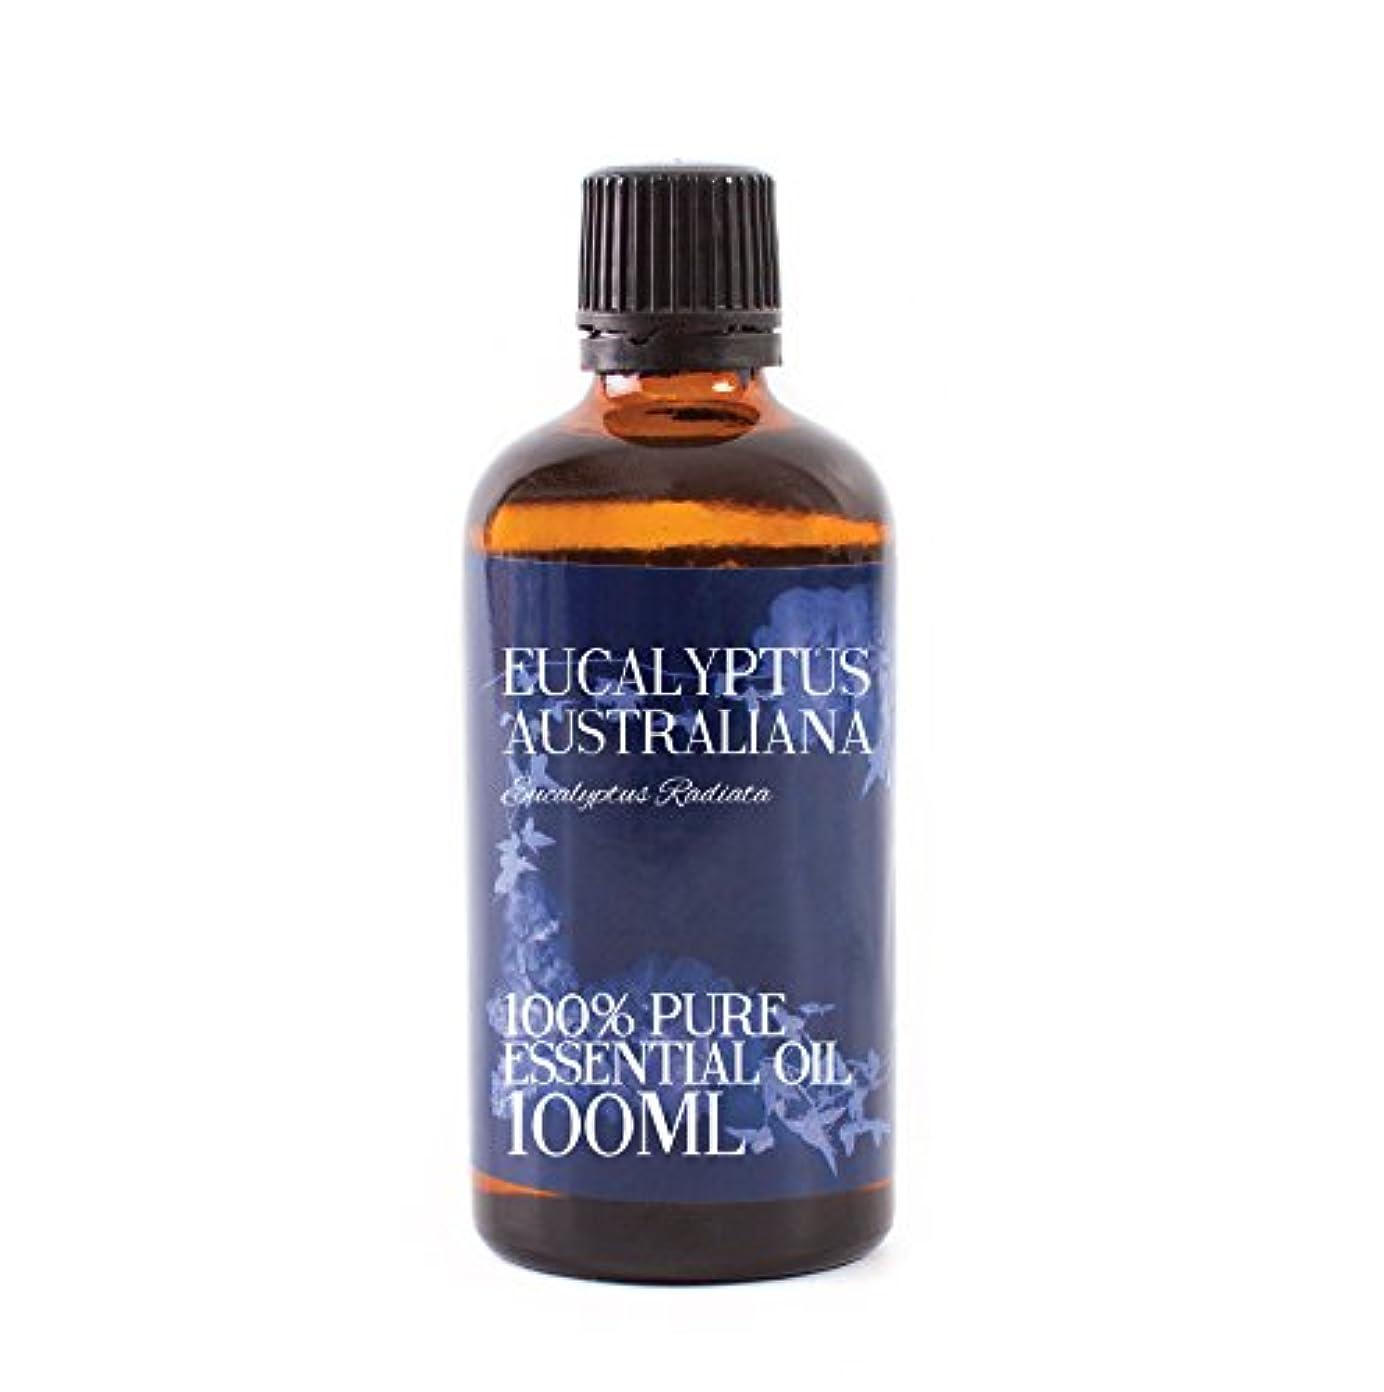 起点学校狂乱Mystic Moments | Eucalyptus Australiana Essential Oil - 100ml - 100% Pure